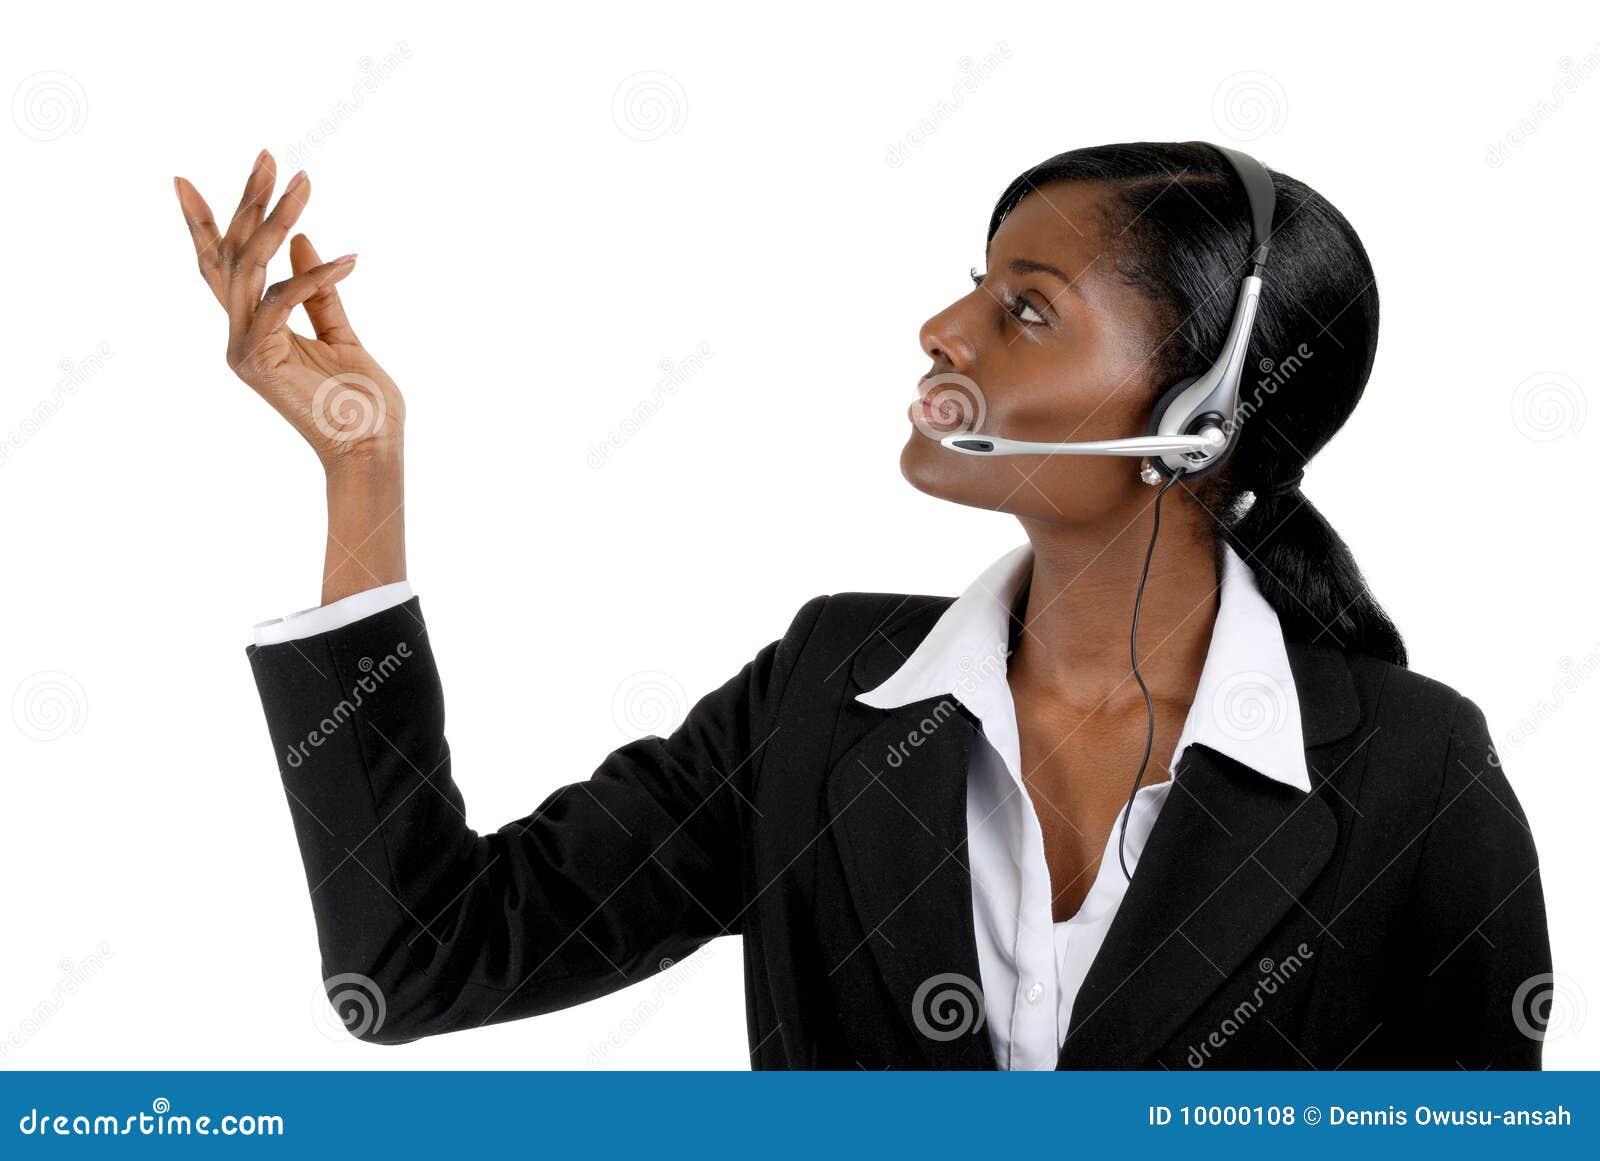 Business support operator presentation